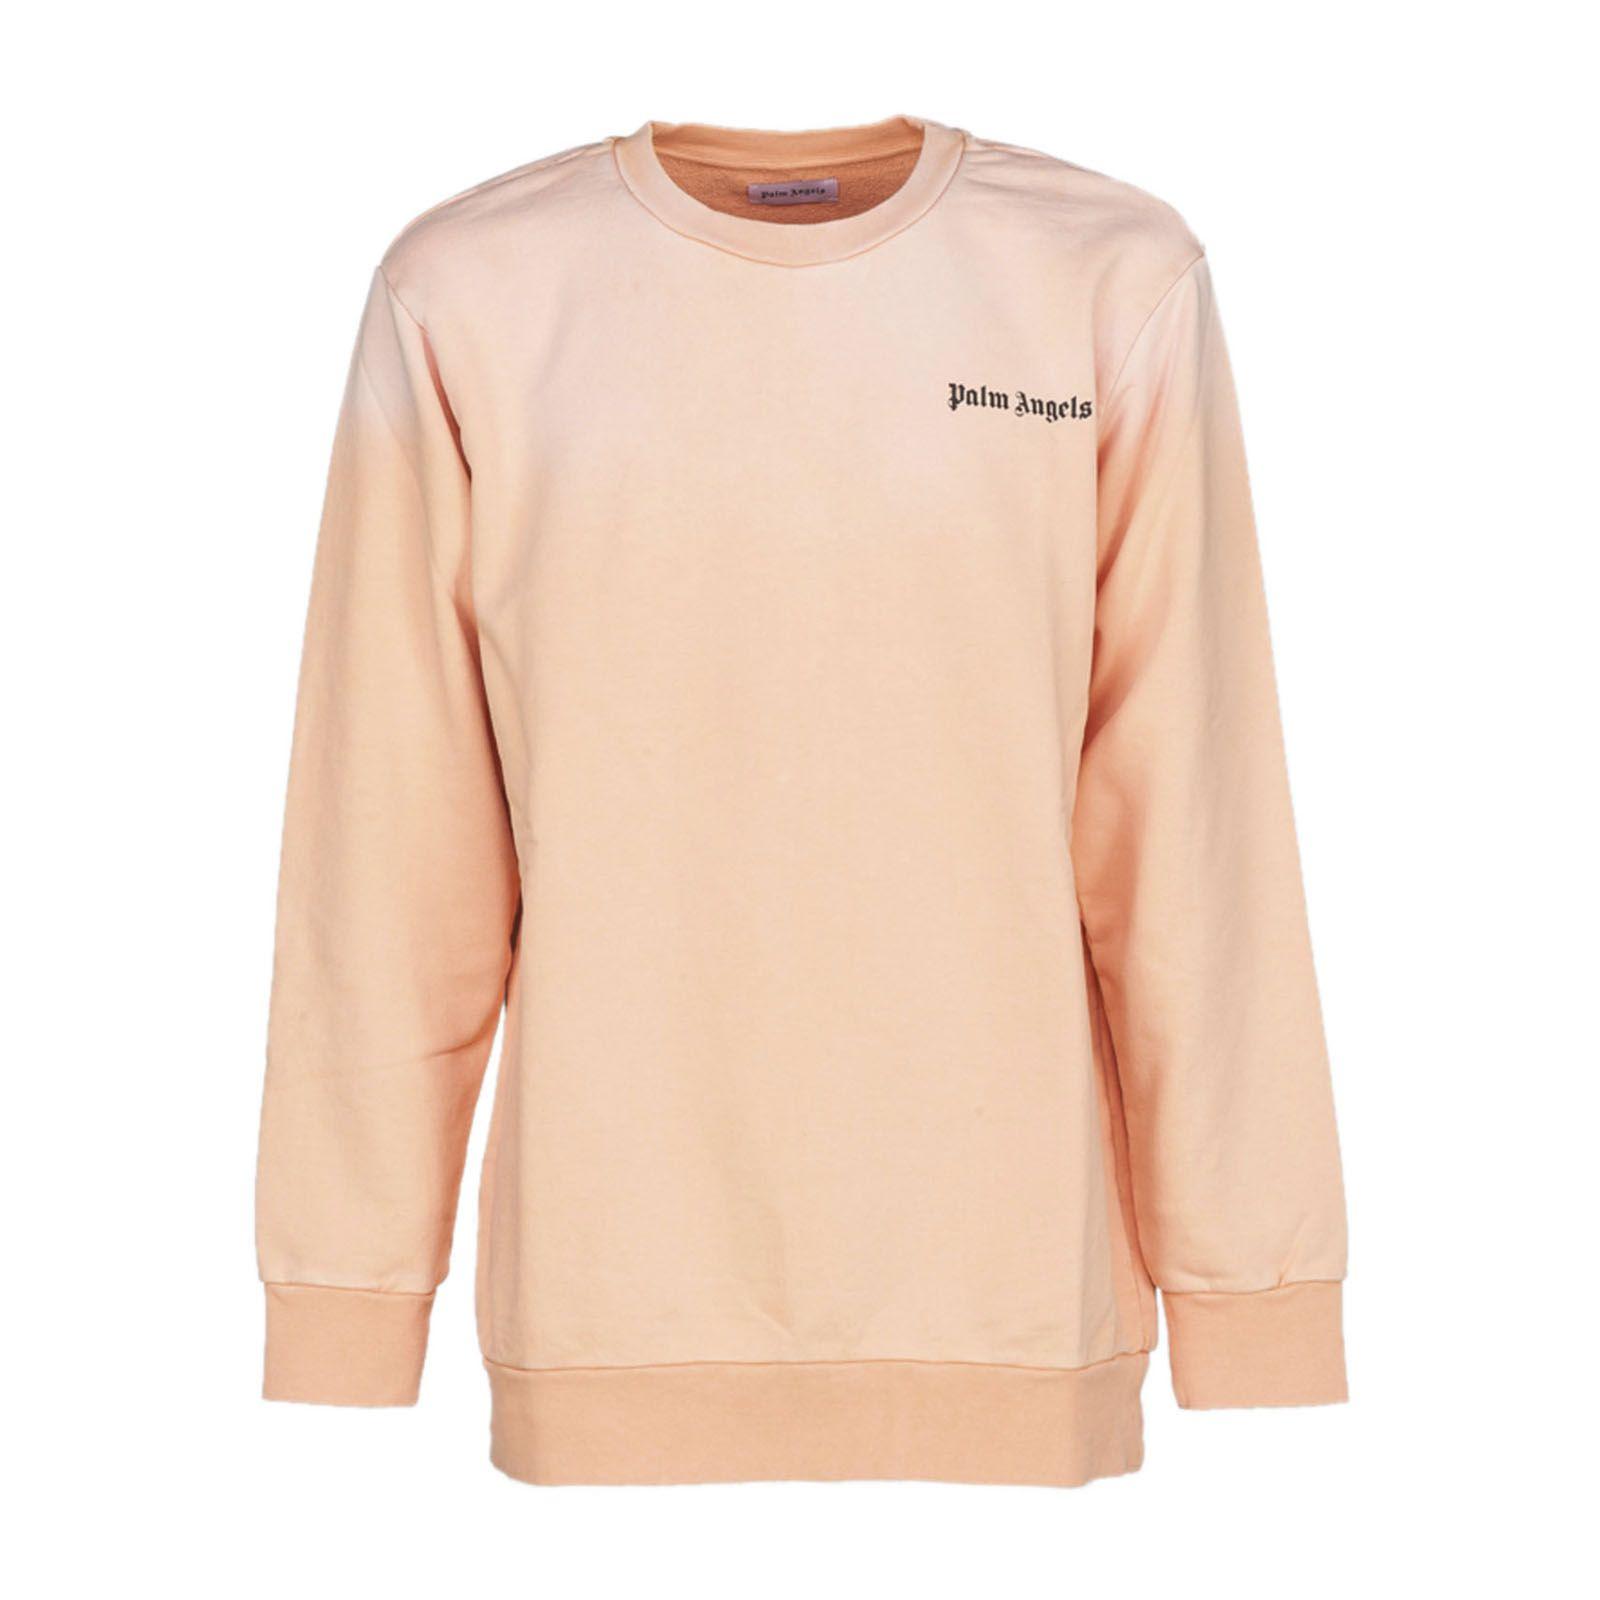 Palm Angels palm Capture Sweatshirt